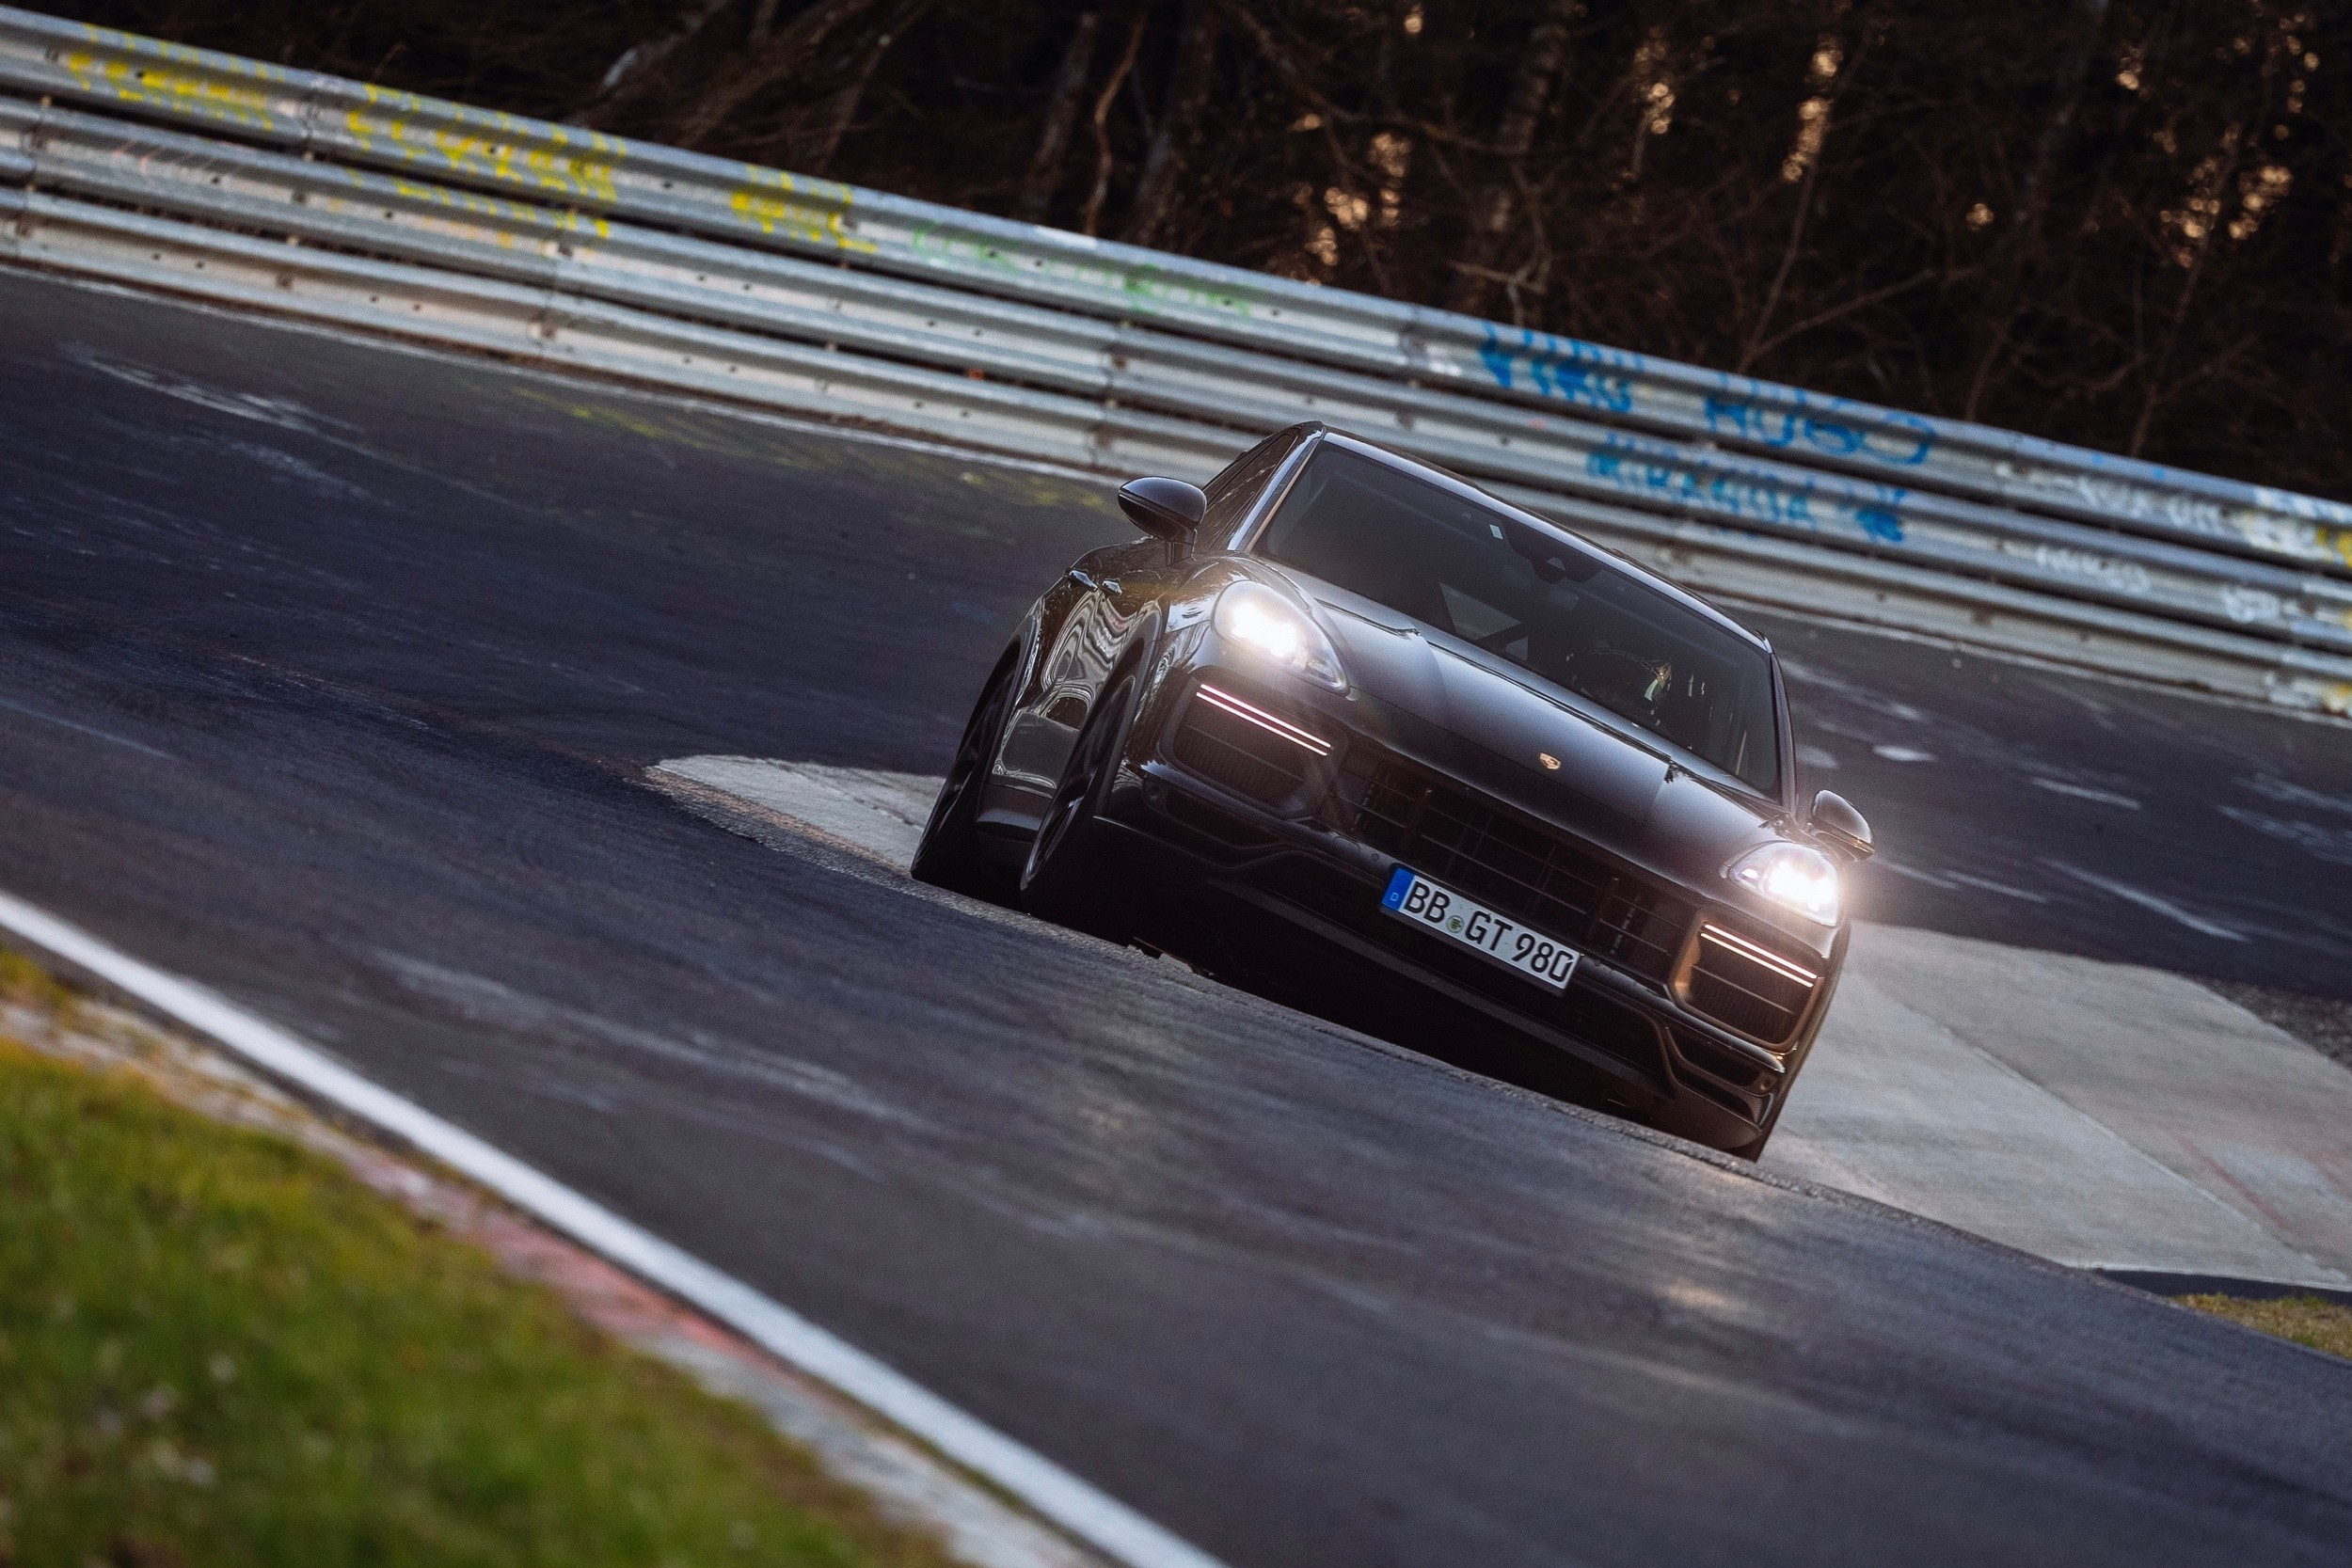 New Porsche Cayenne Nurburgring Lap Record